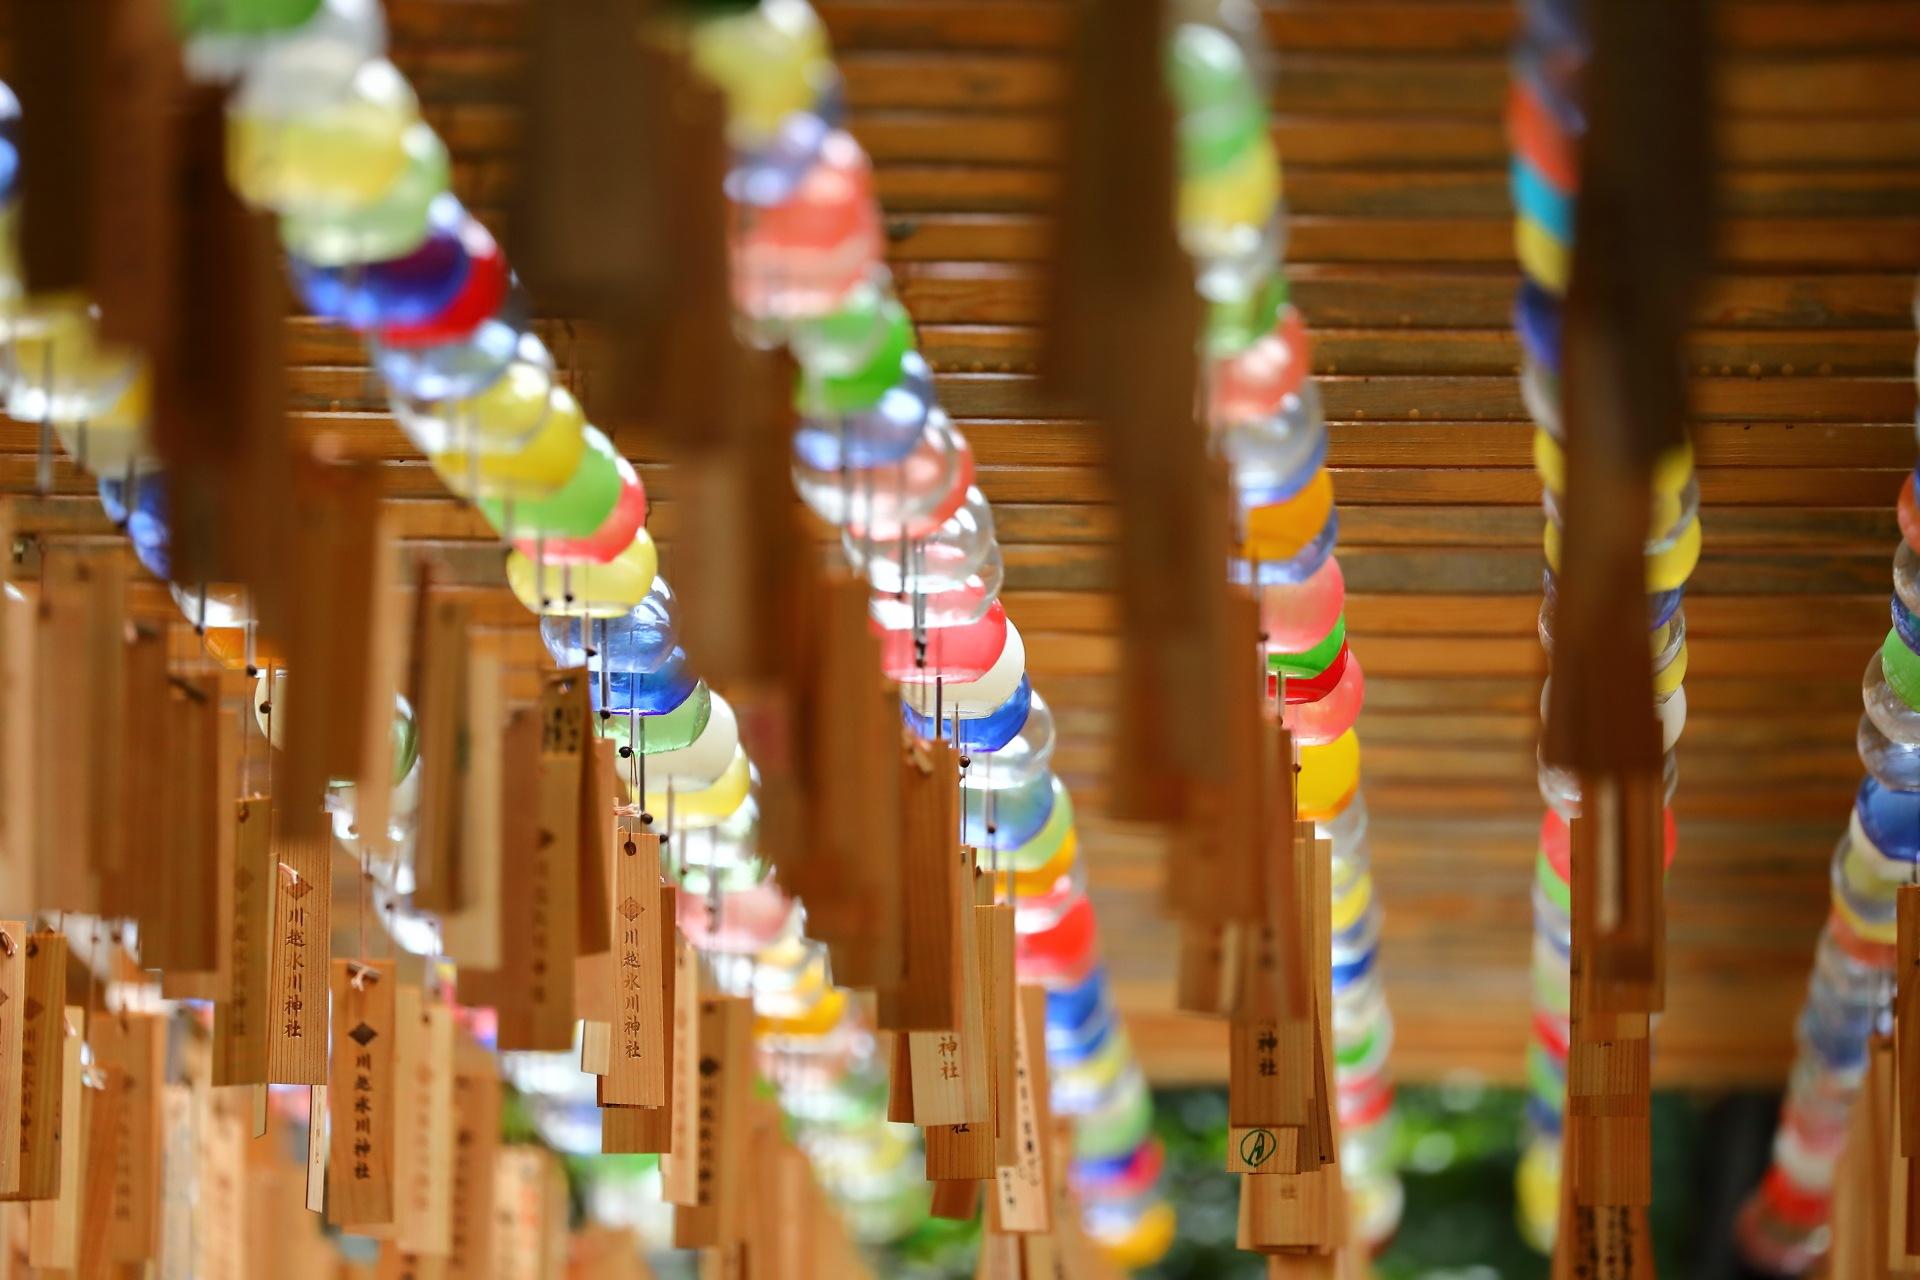 Bright Line by takashi.mizoguchi